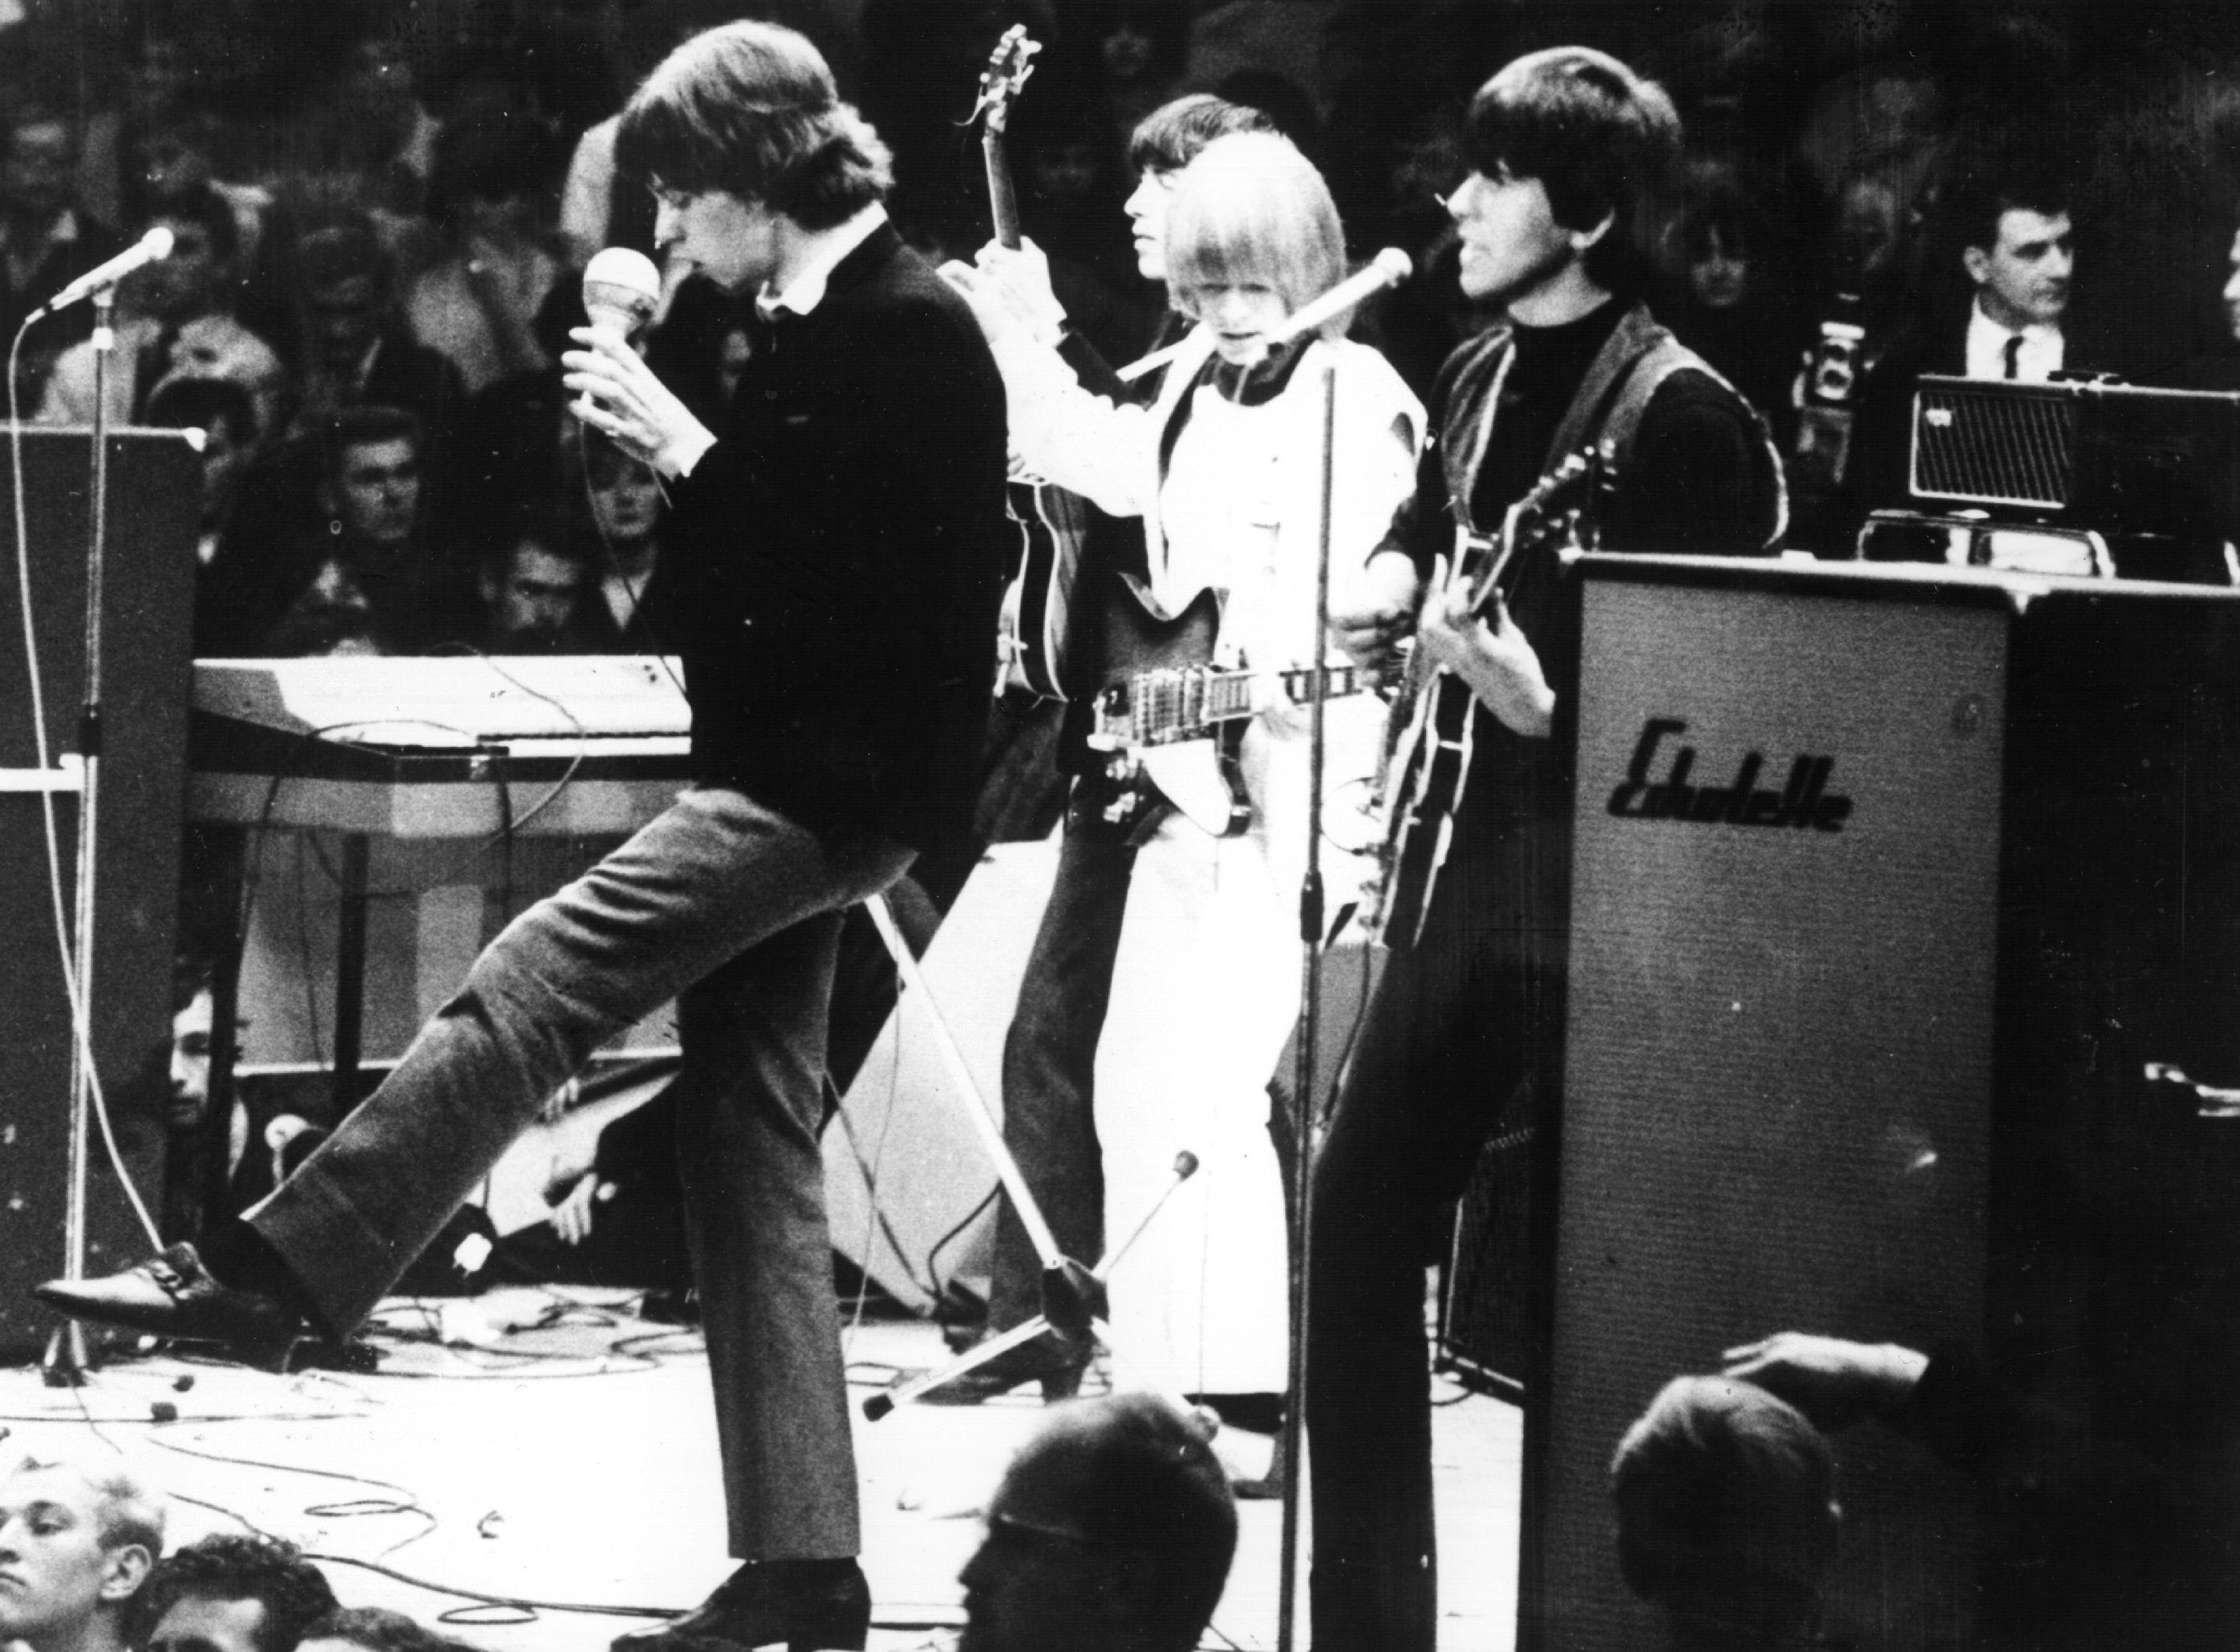 Rolling Stones Mick Jagger in Berlin Oct. 1 1965